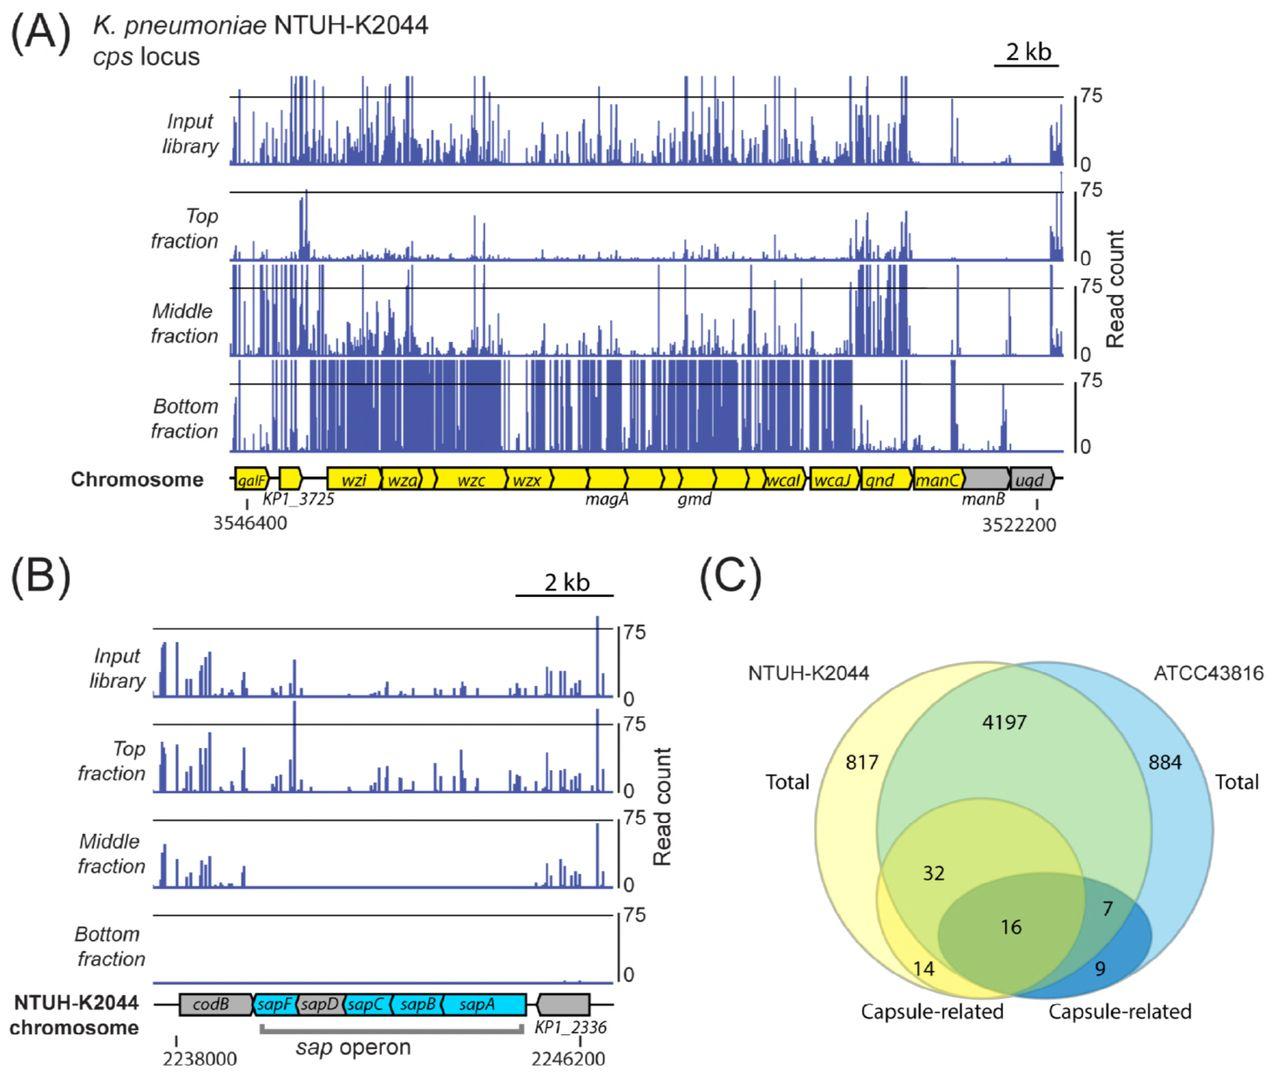 The capsule regulatory network of Klebsiella pneumoniae